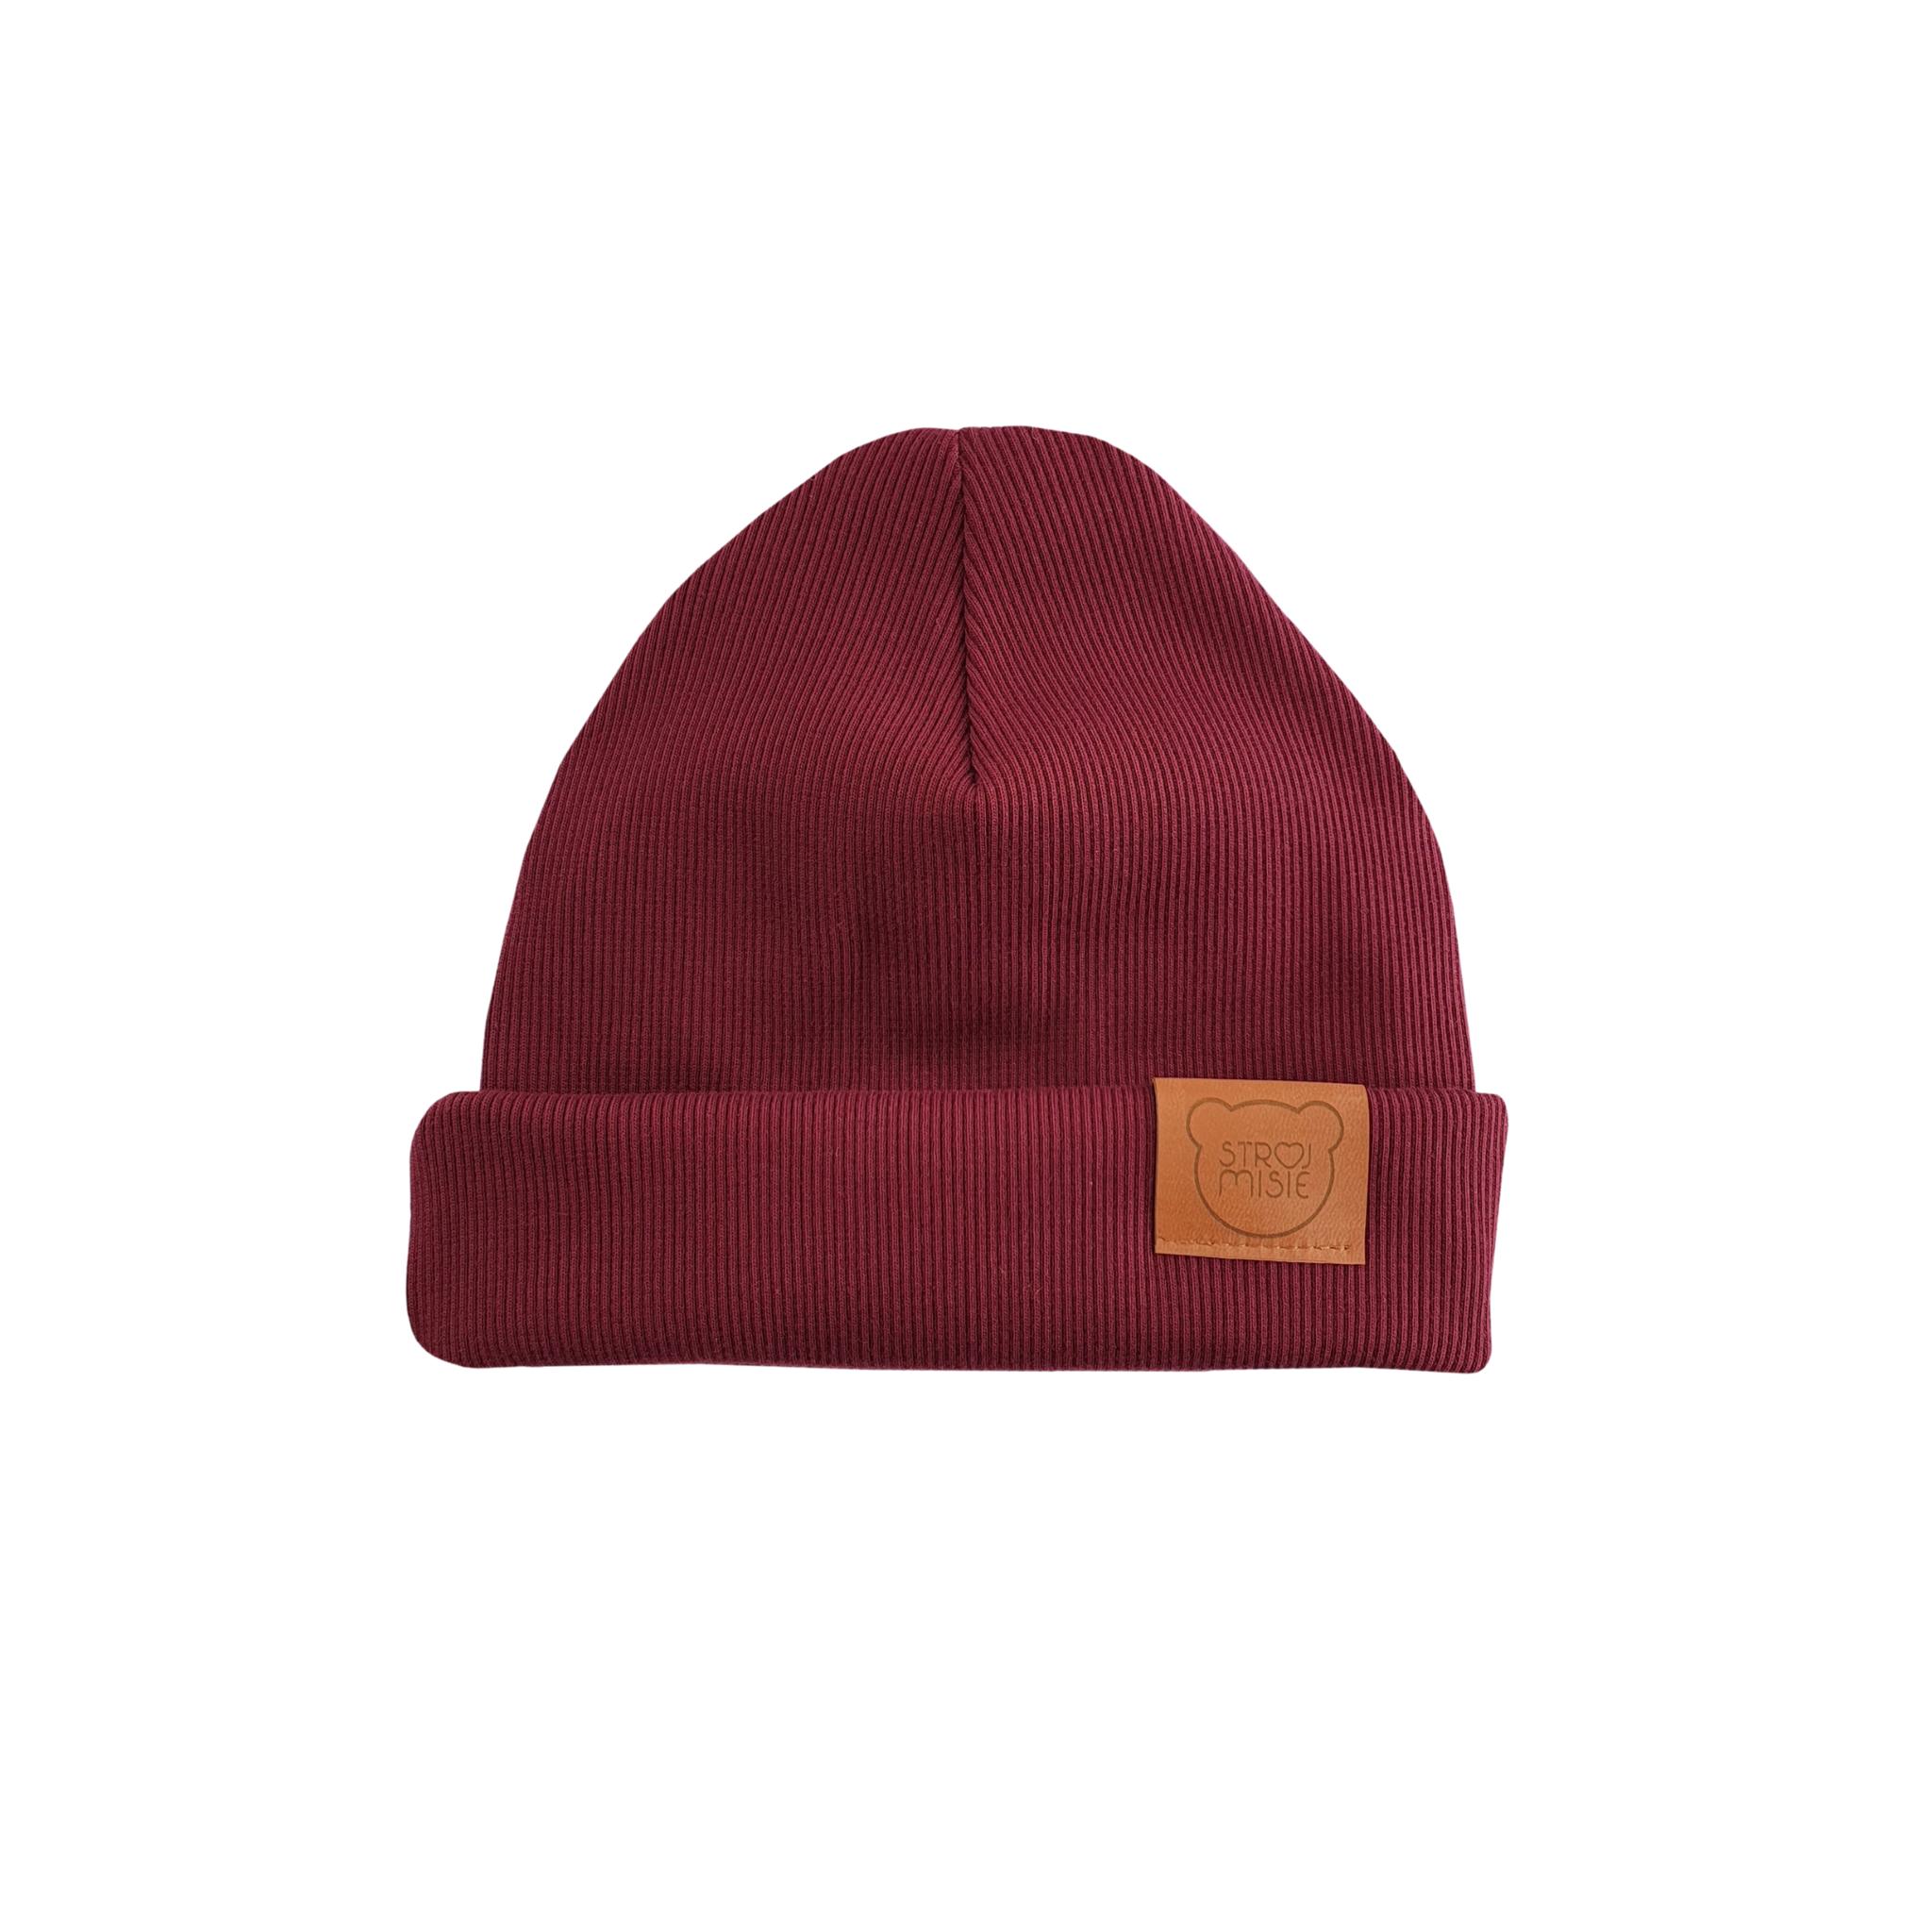 Strojmisie RED HAT | KIDS HAT BURGUNDY | BABY HAT BORDEAUX RED